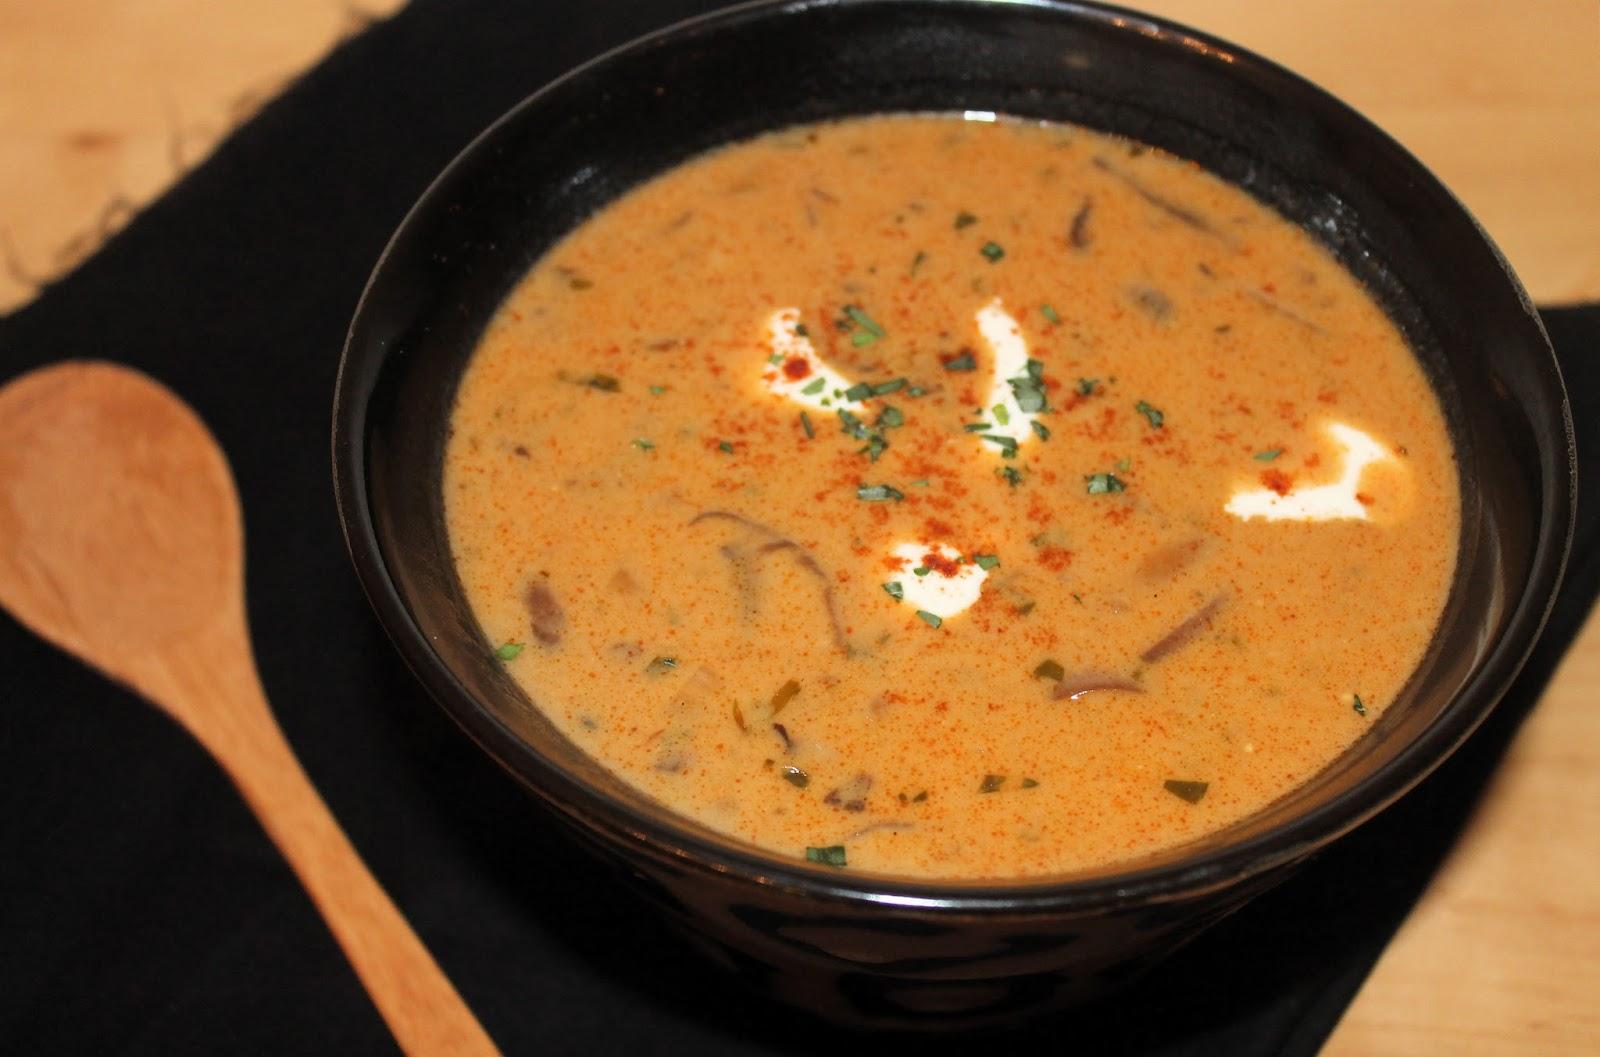 Savory Moments: Hungarian mushroom soup